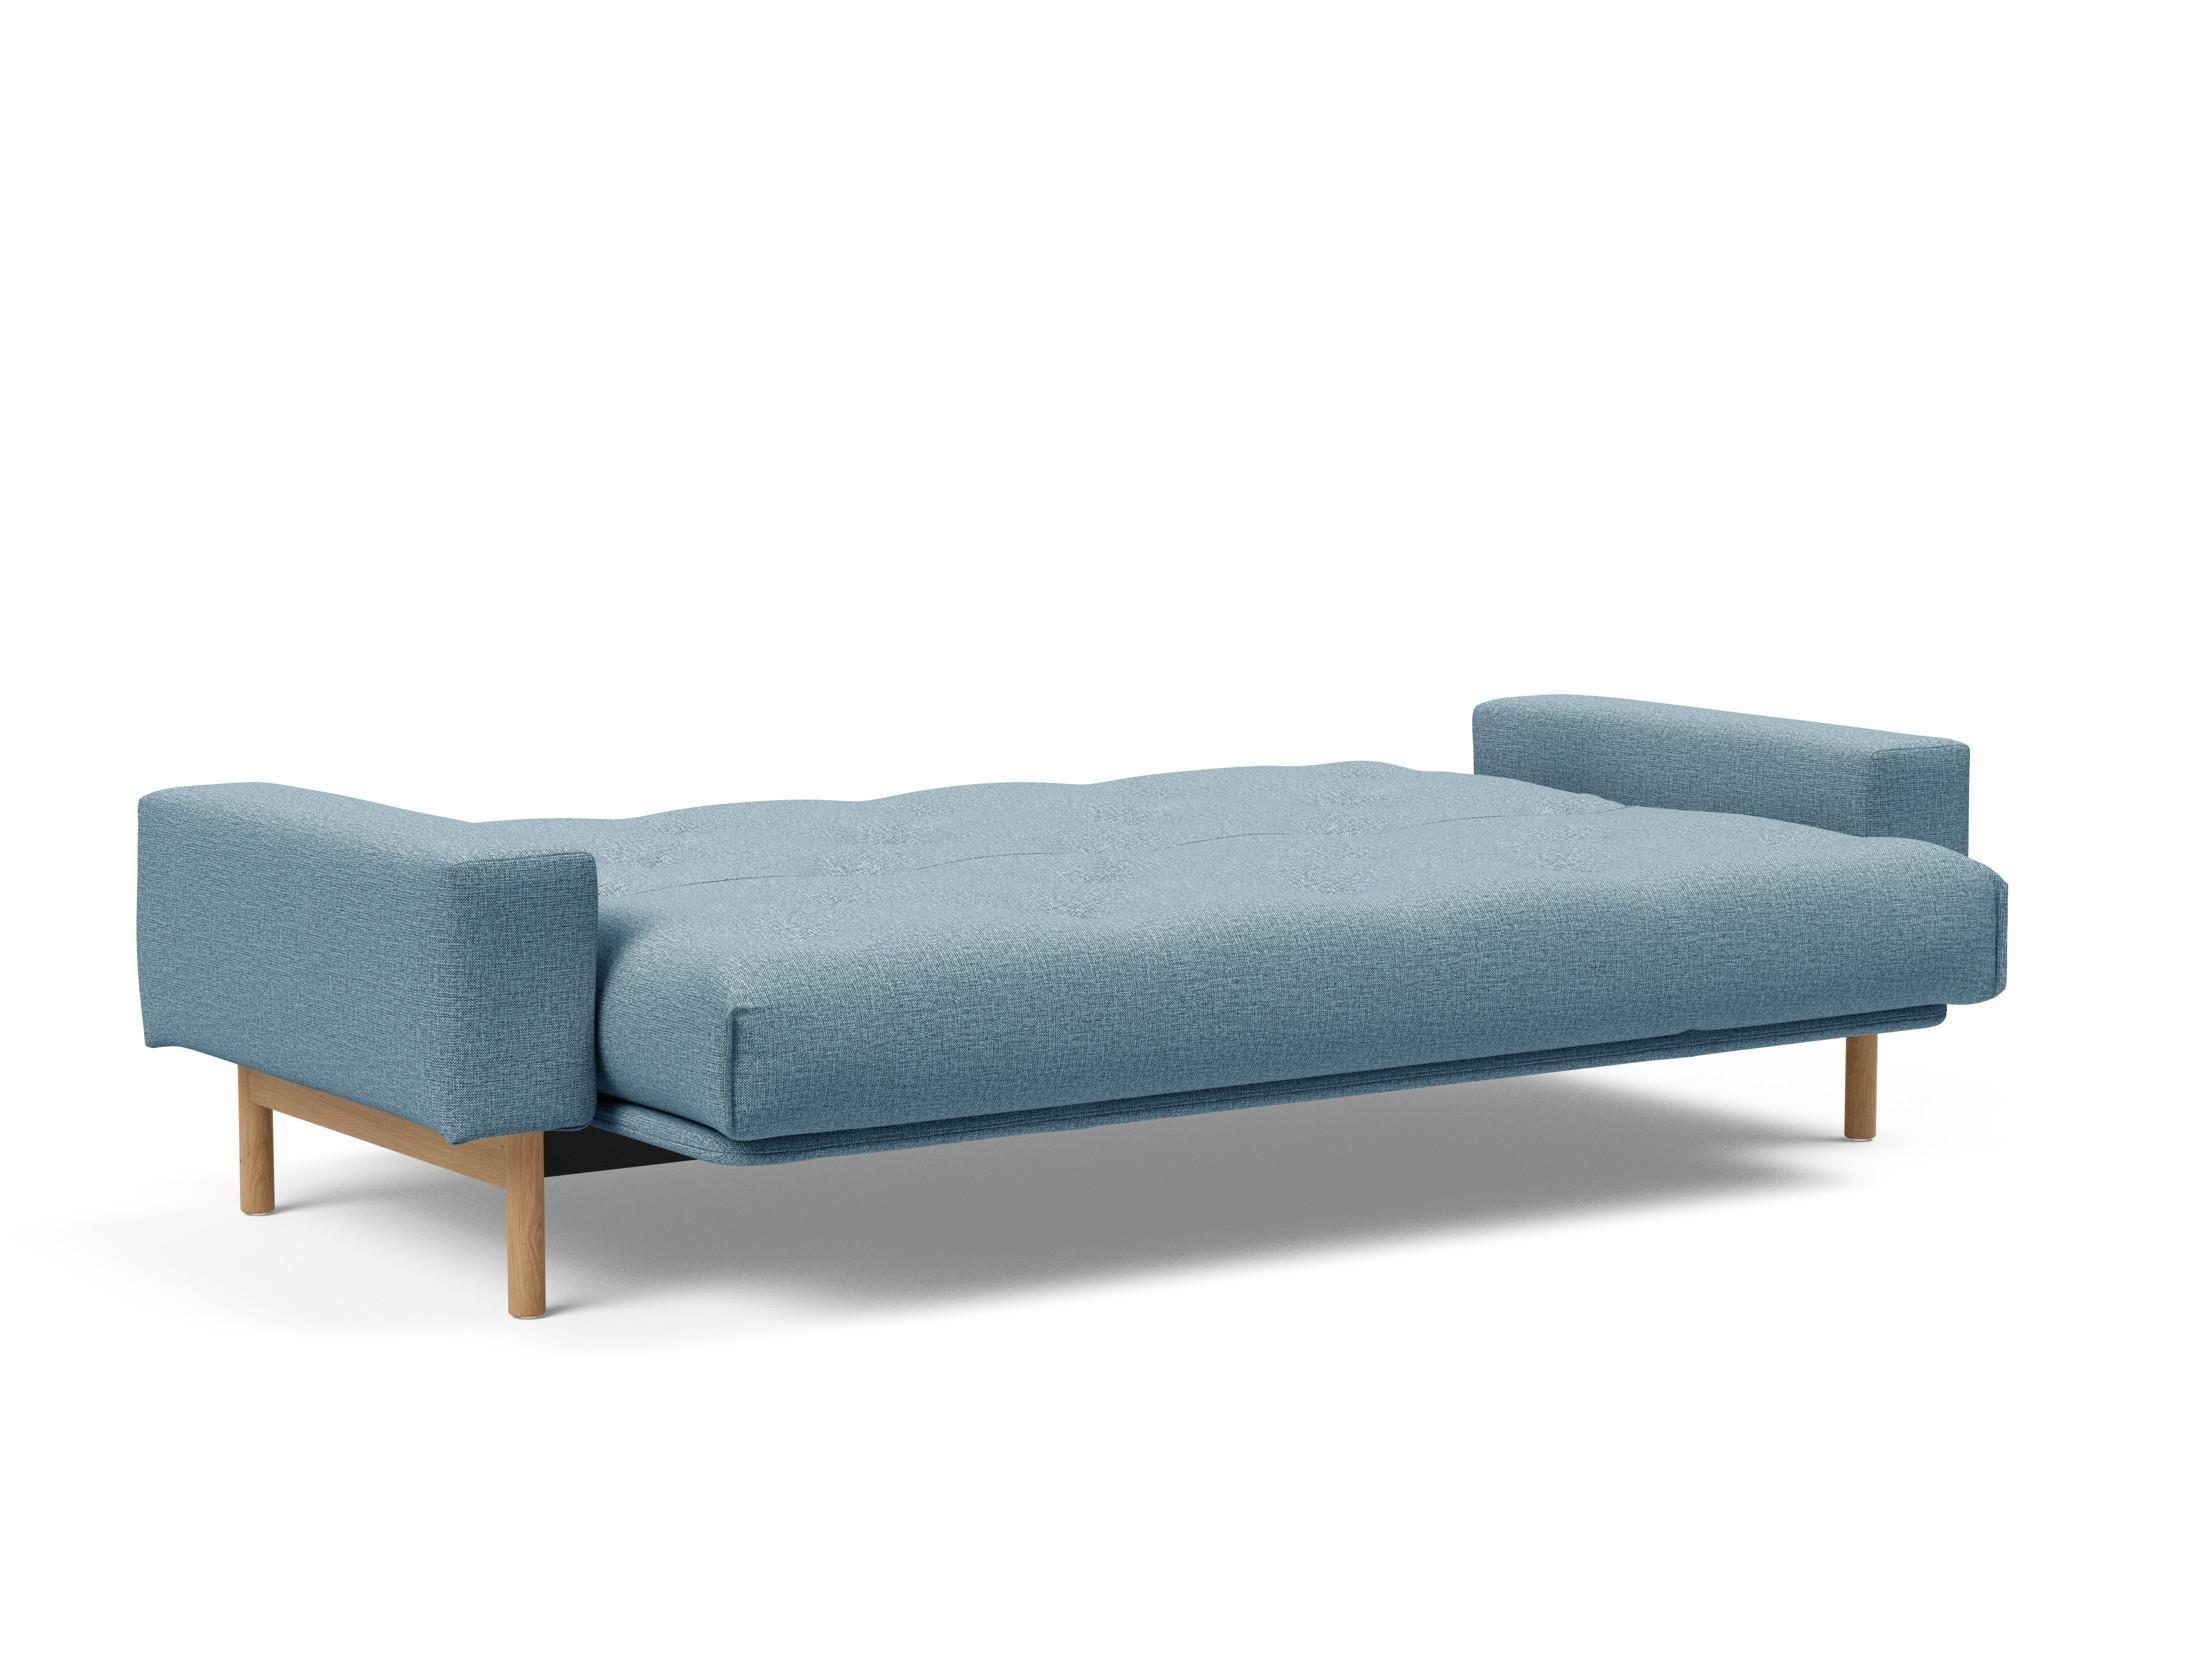 media/image/Mimer-Sofa-Bed-Nordic-Mattress-525-p8-web.jpg